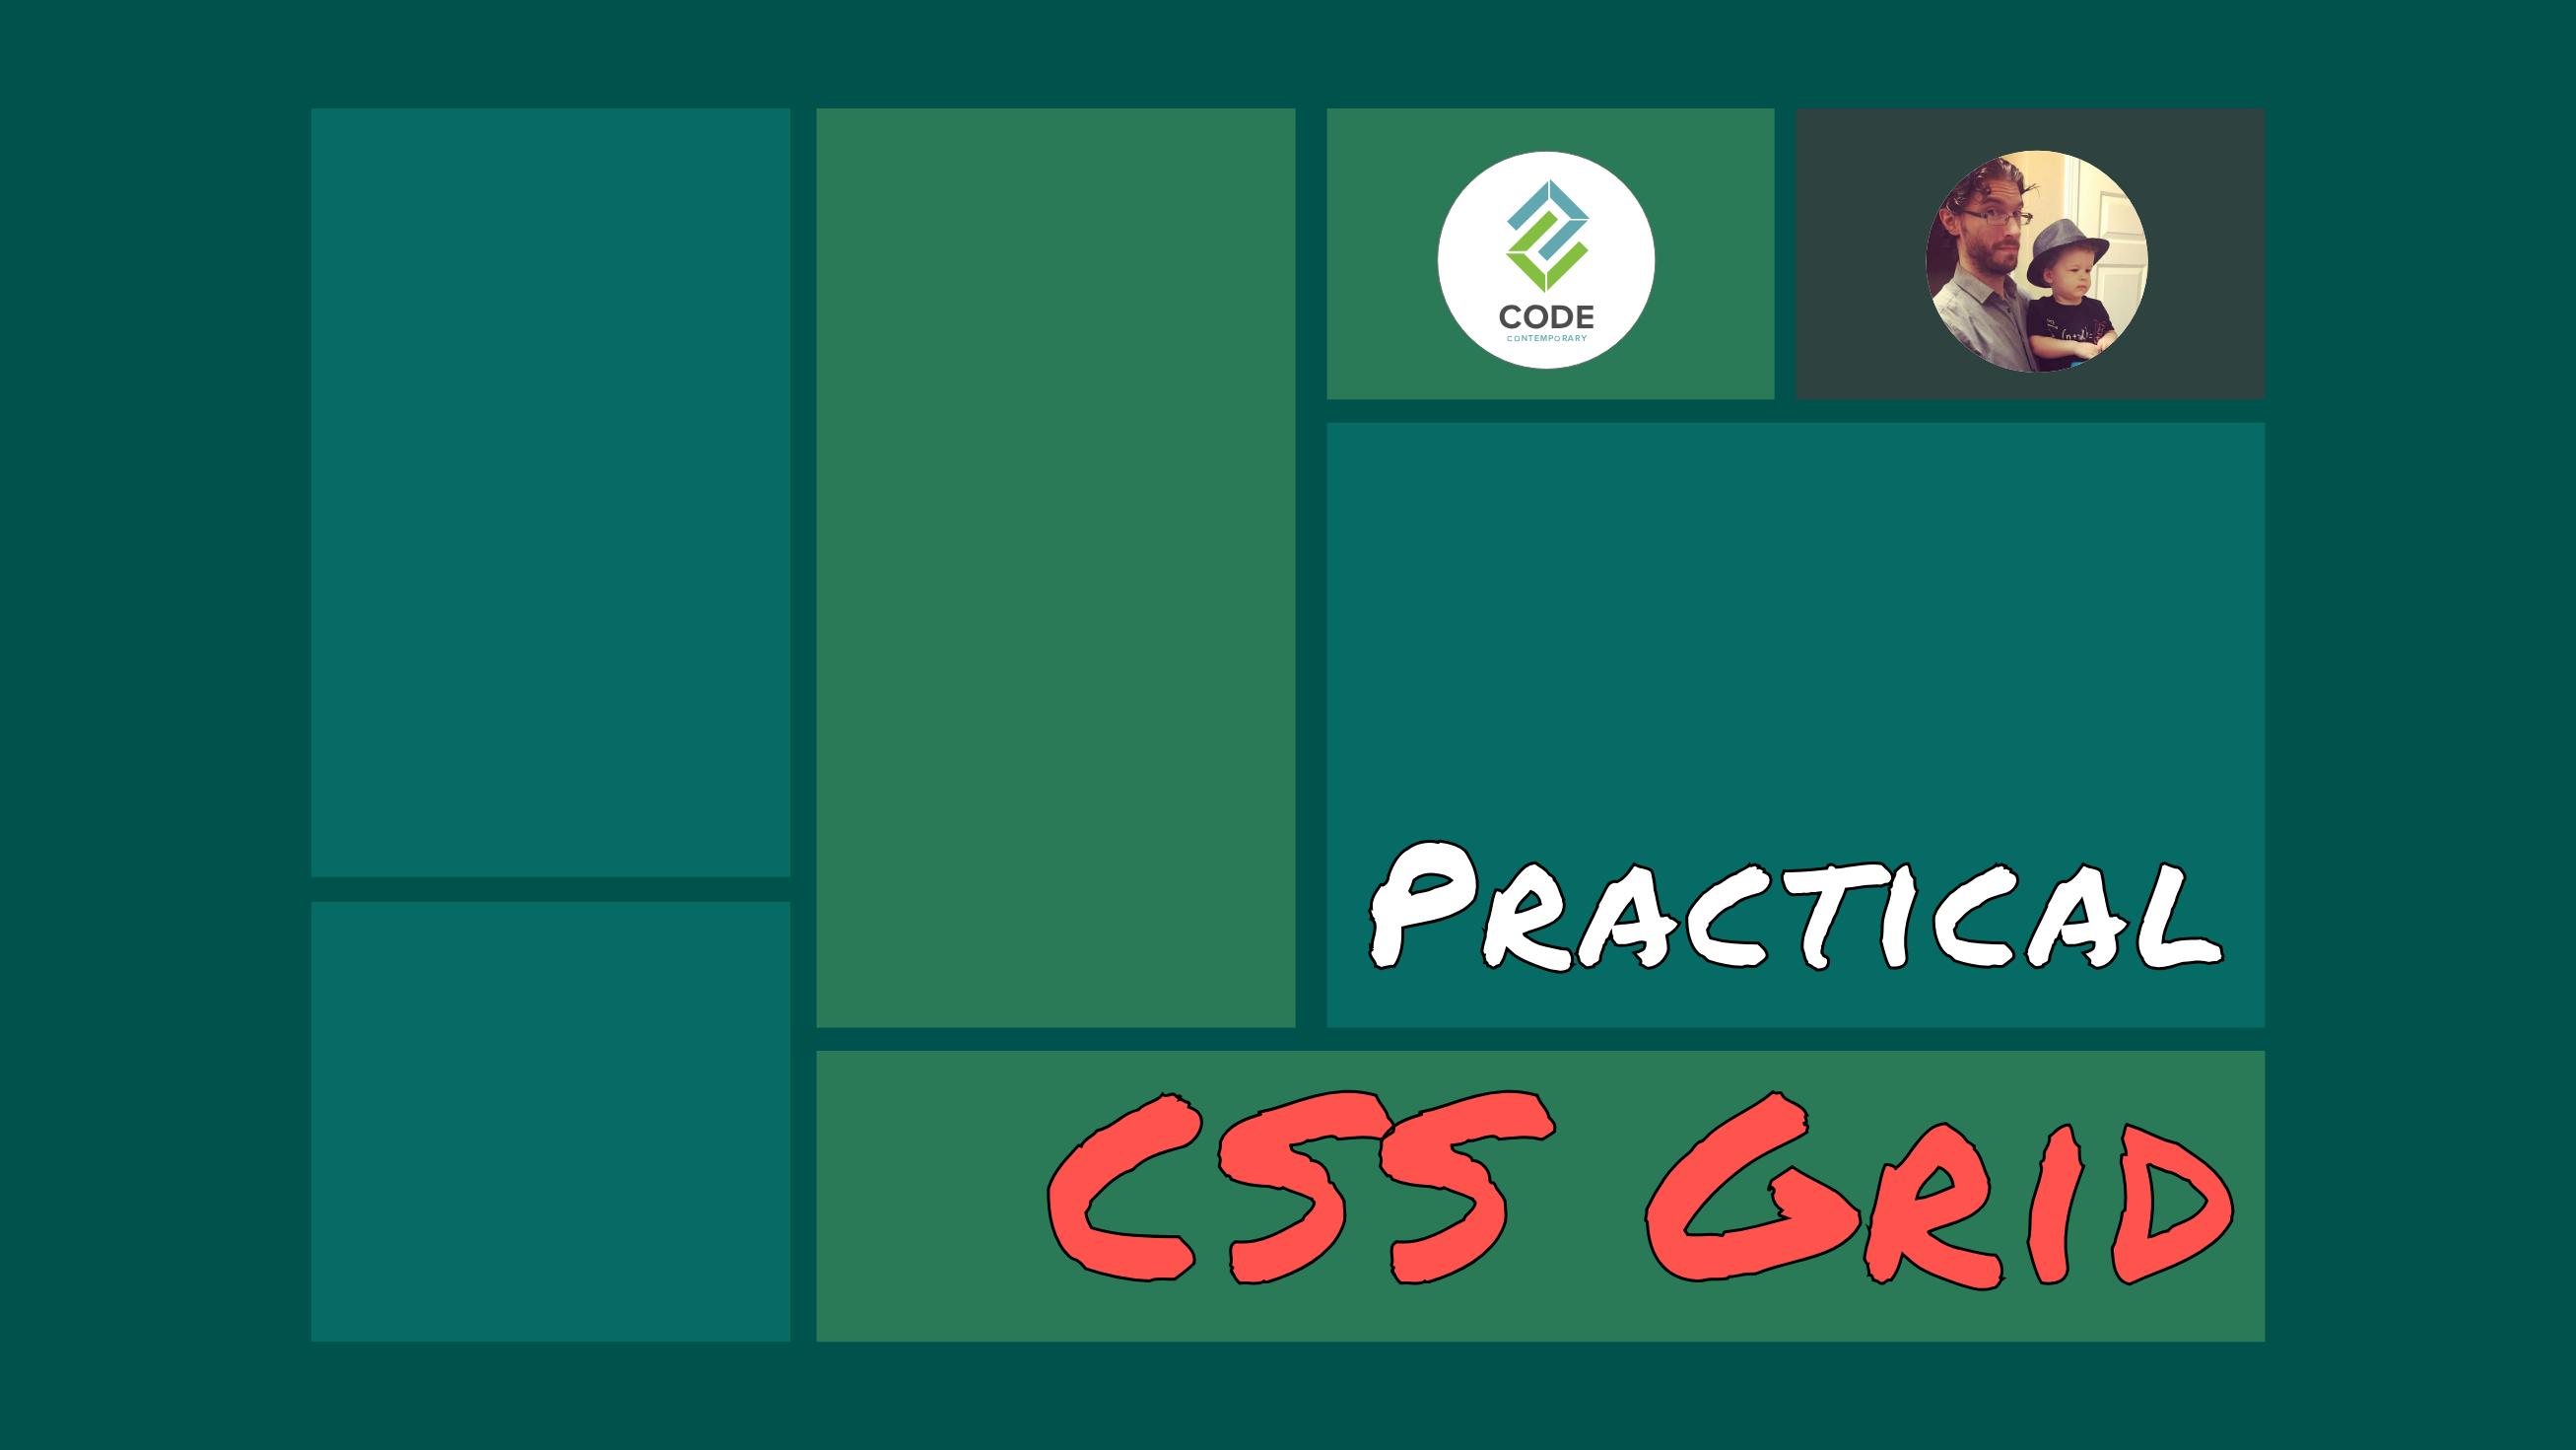 Practical Grid Promo Image